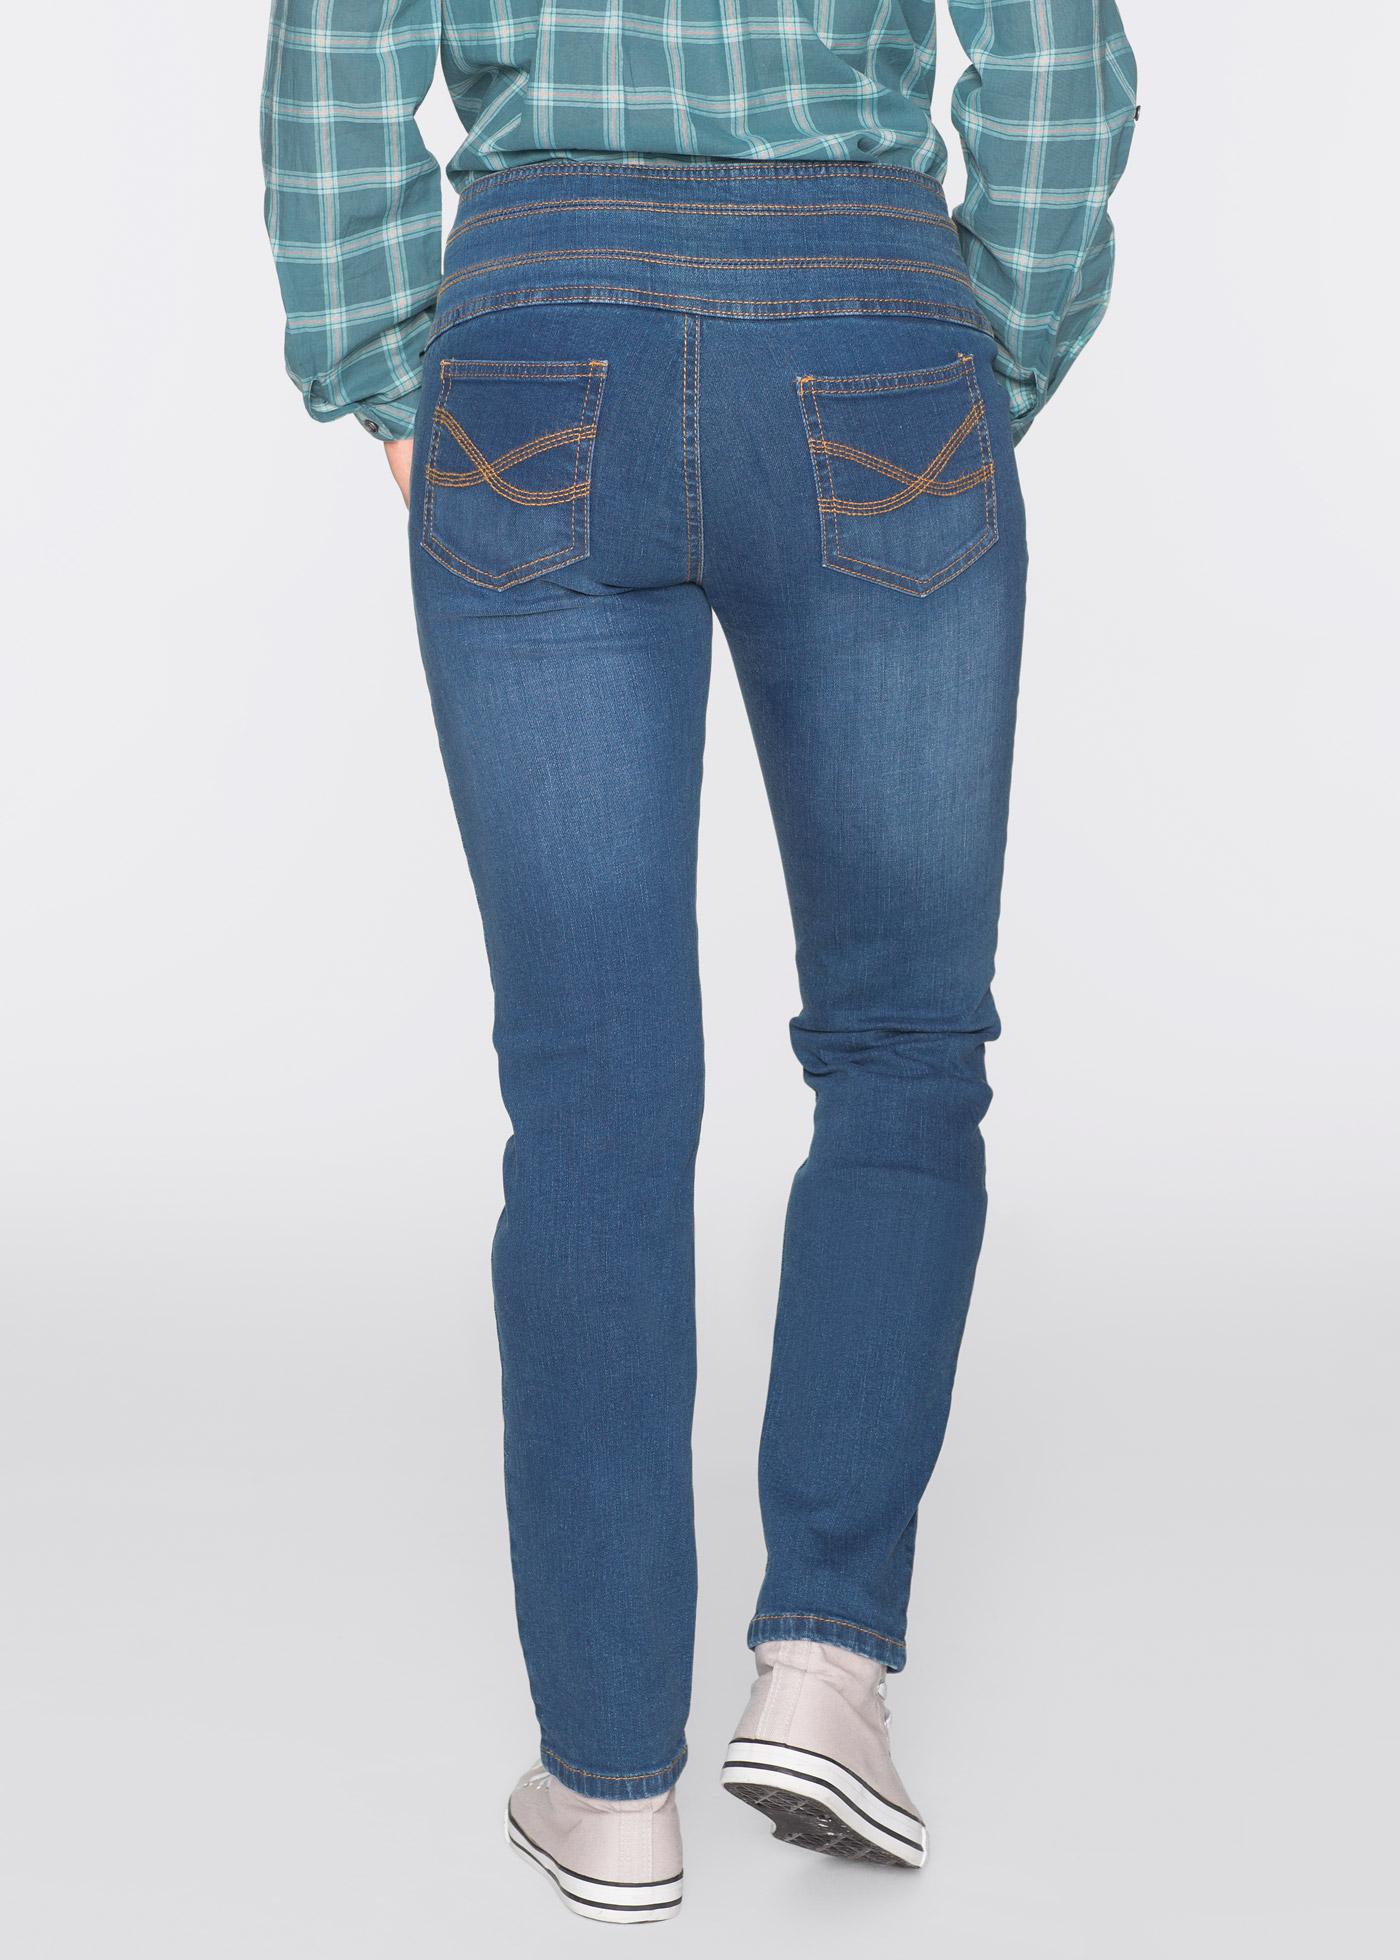 stretch jeans bauch weg r hre gr 44 schwarz damen hose. Black Bedroom Furniture Sets. Home Design Ideas